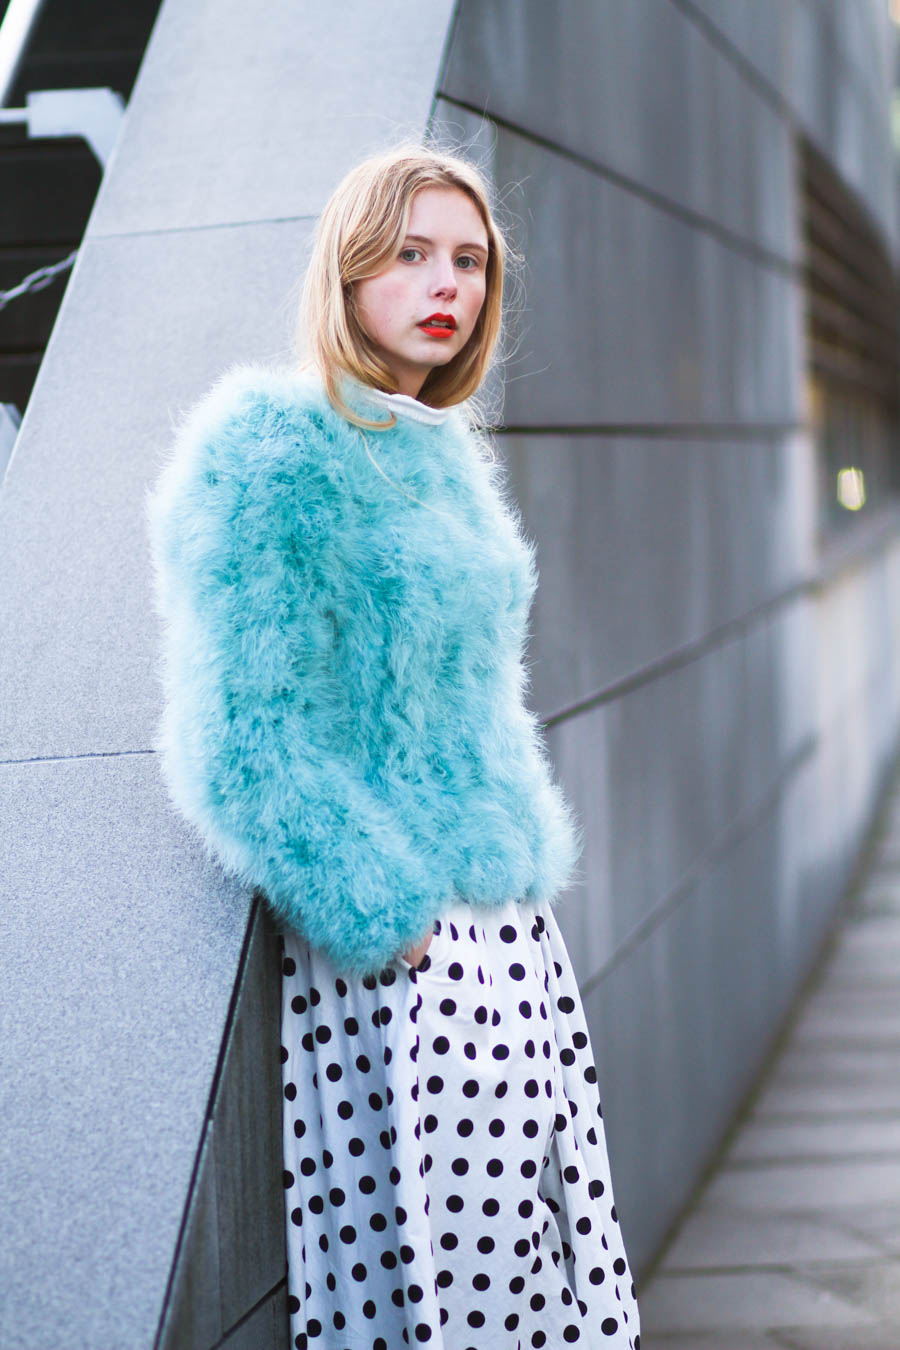 outfit December nemesis babe marie jensen danish blogger -2-6